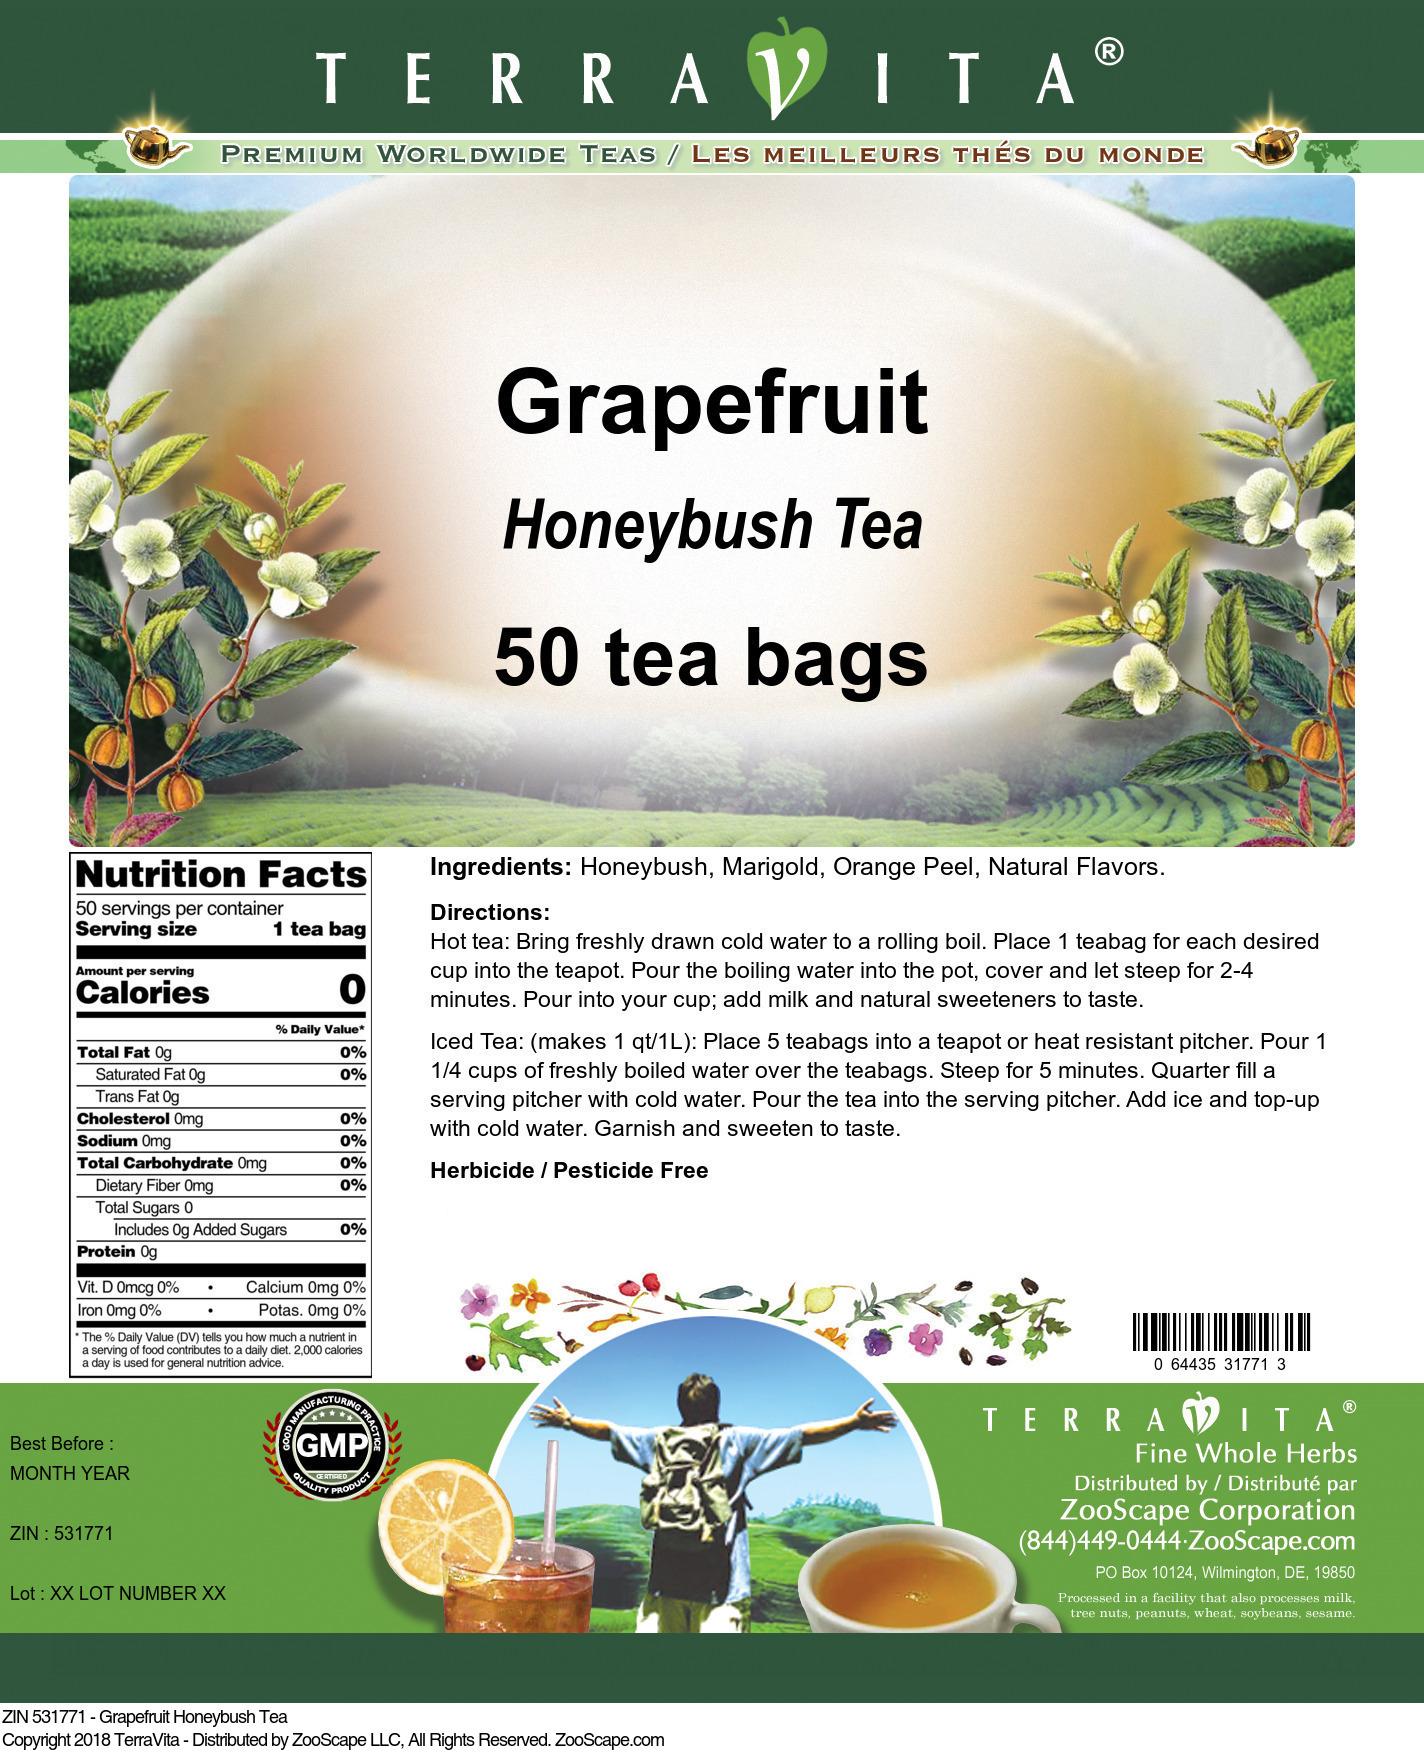 Grapefruit Honeybush Tea